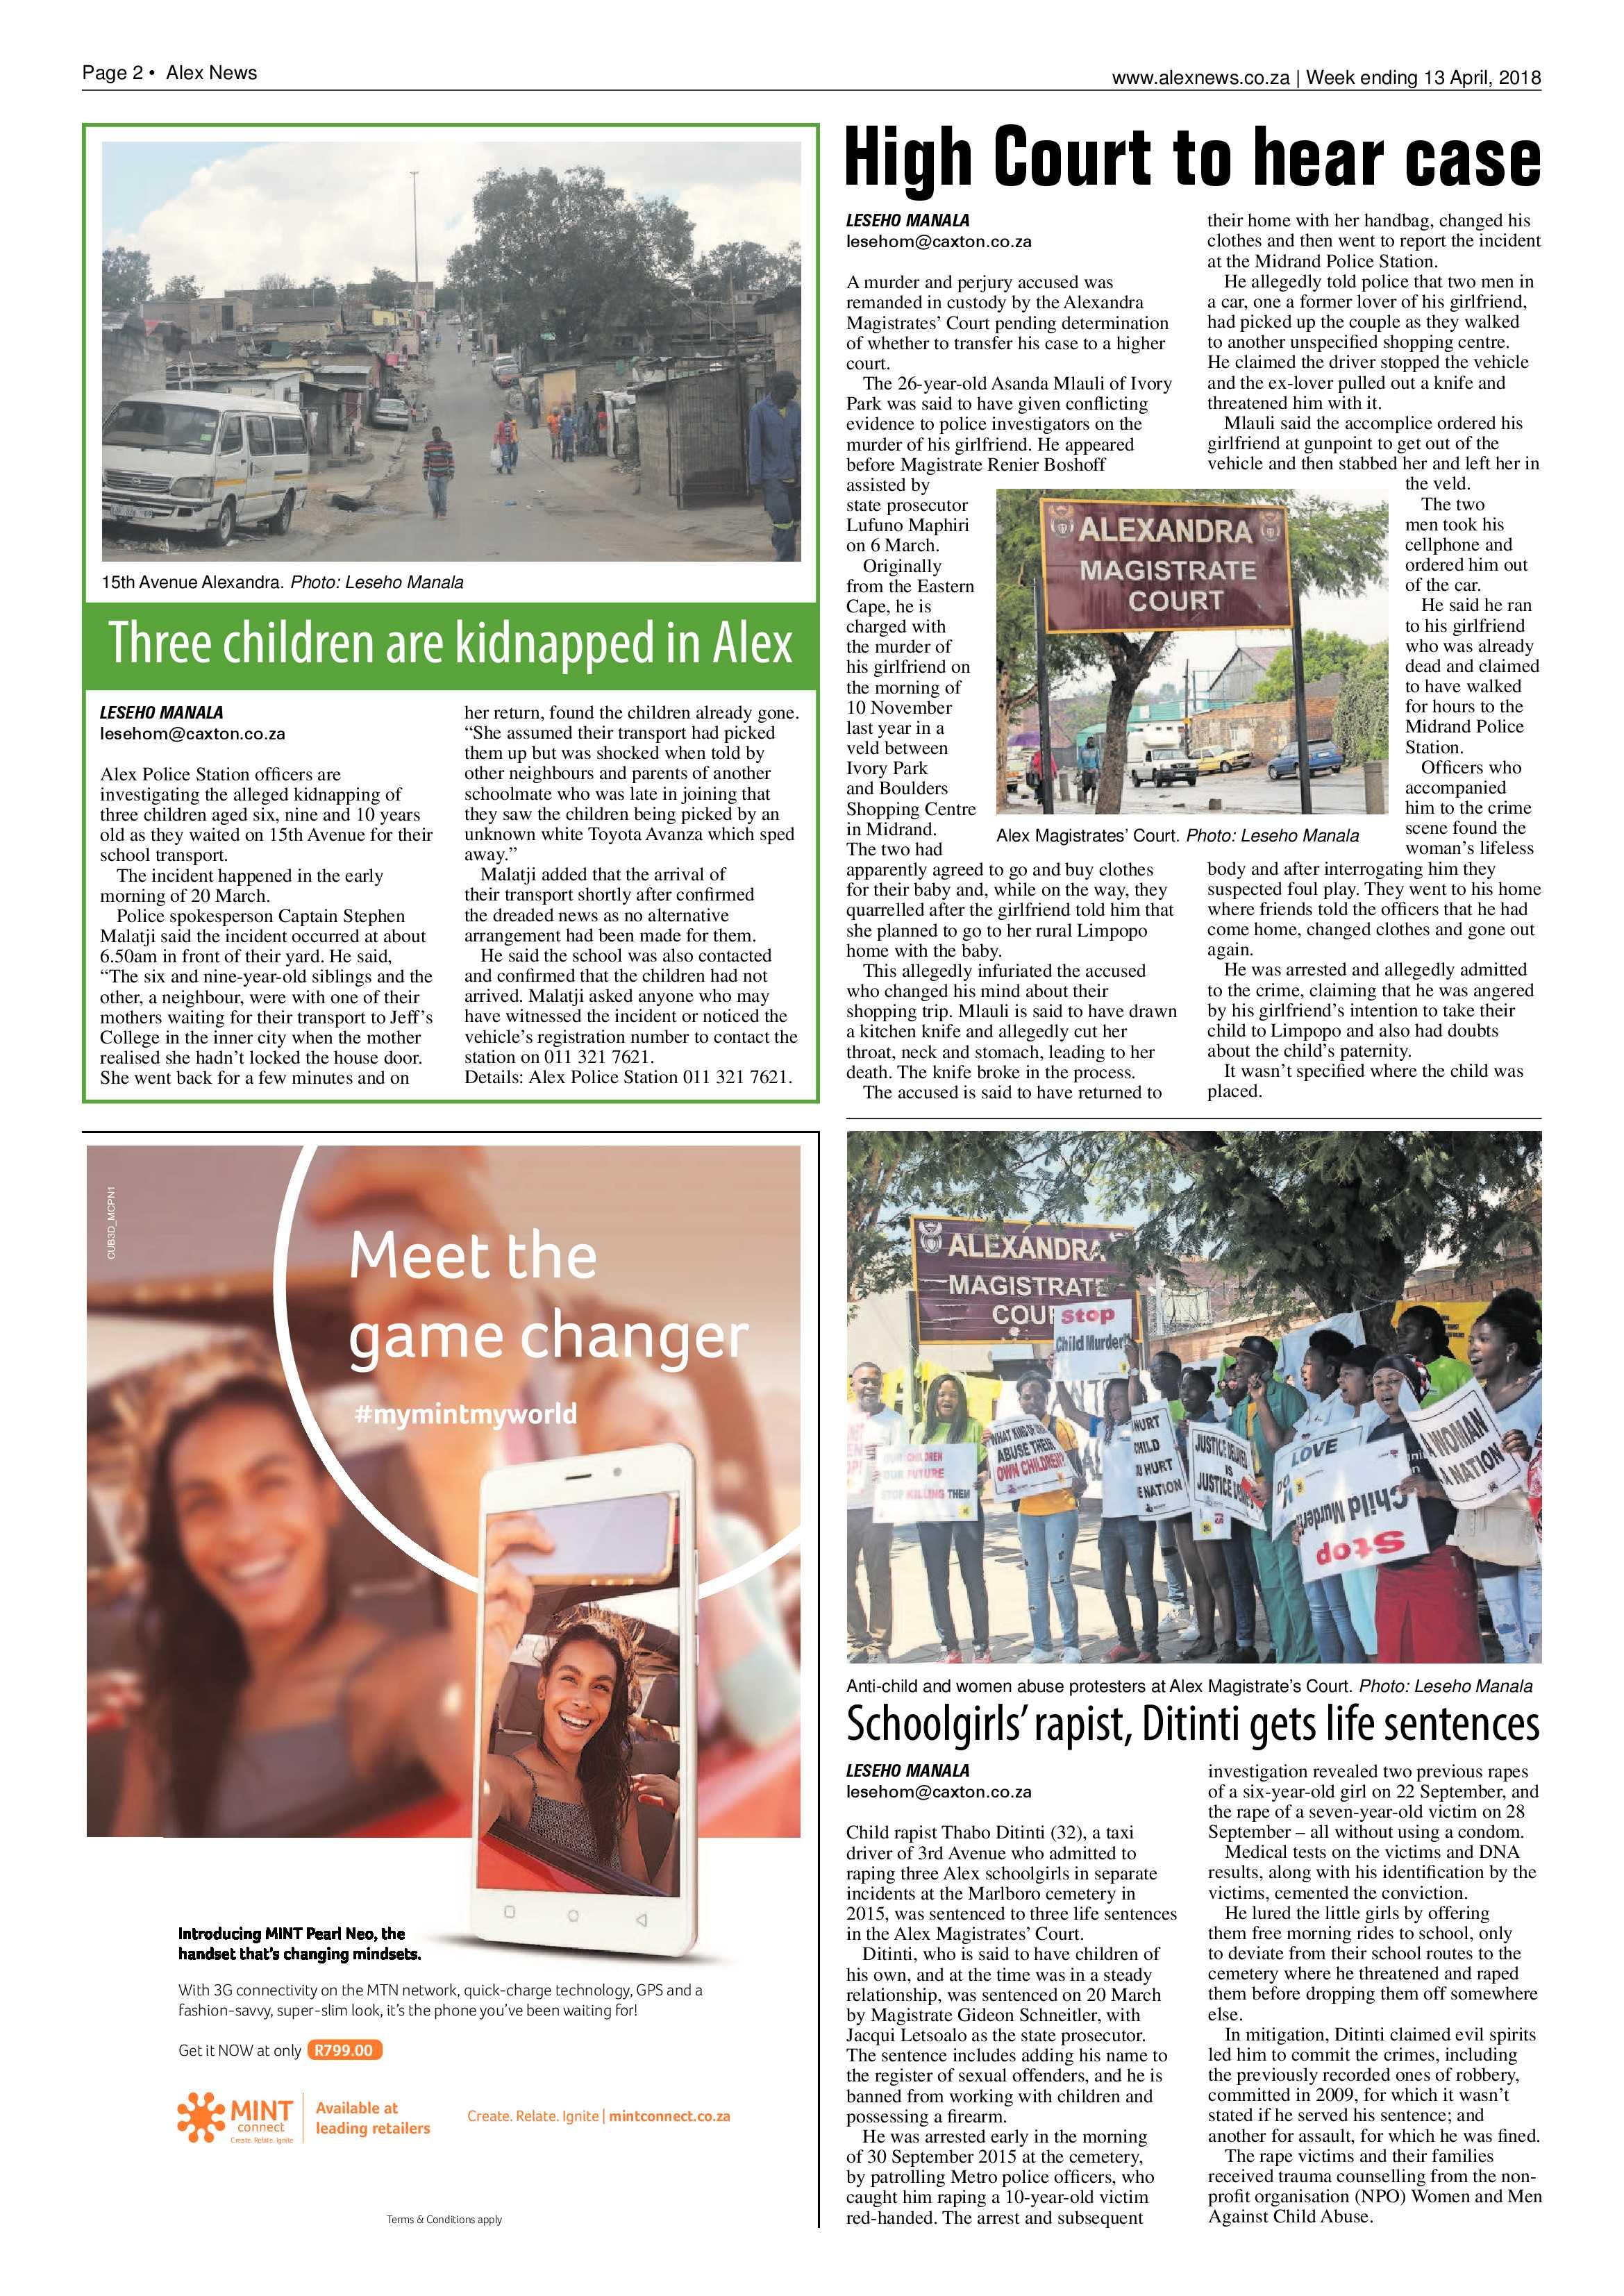 alex-news-13-april-2018-epapers-page-2